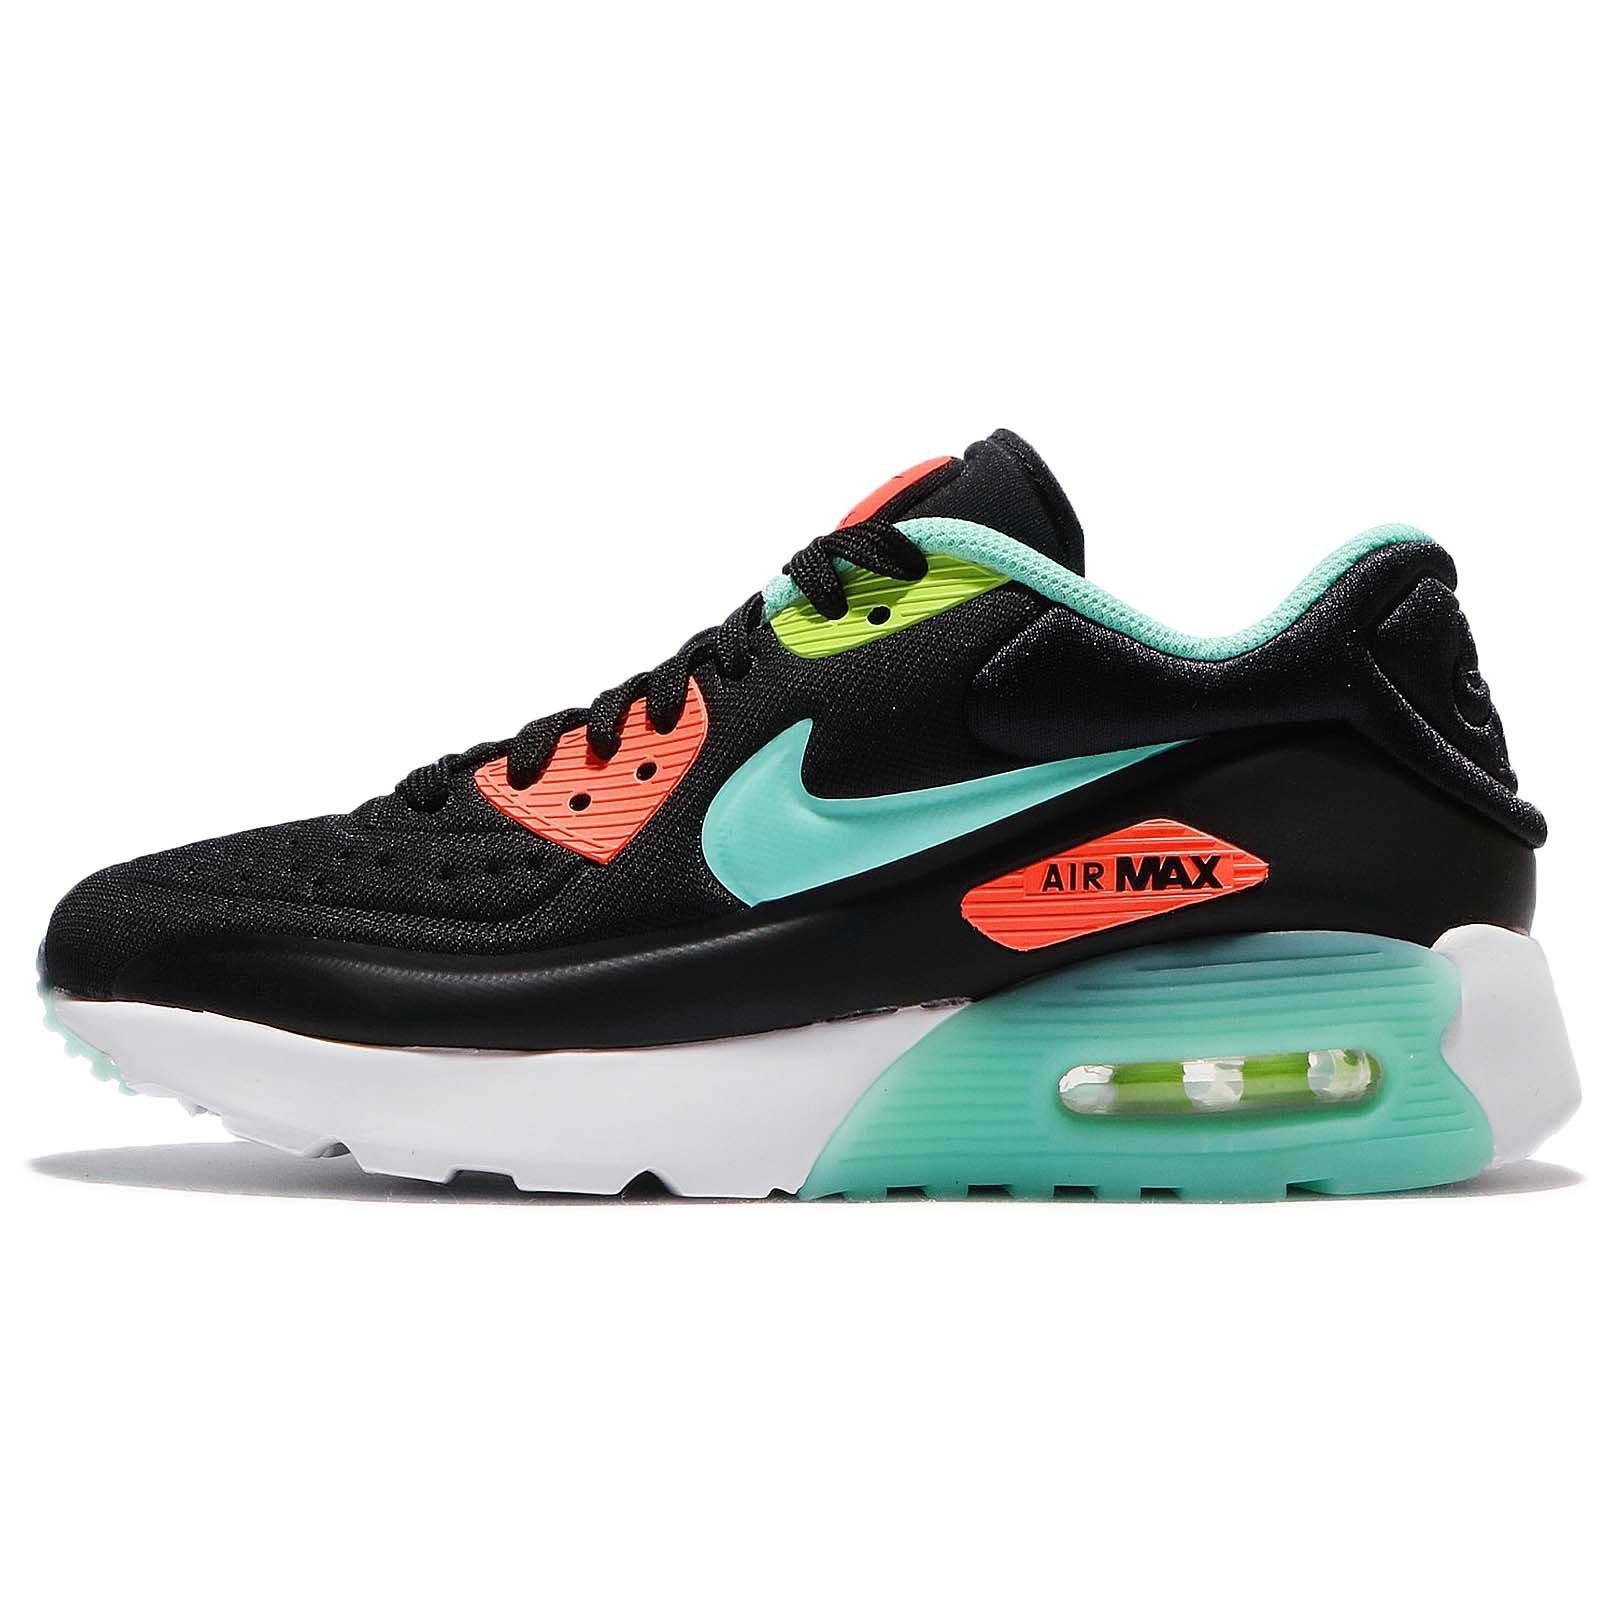 half off 8767d f5cb8 Galleon - Nike Air Max 90 Ultra Running Gradeschool Girl s Shoes Size 3.5